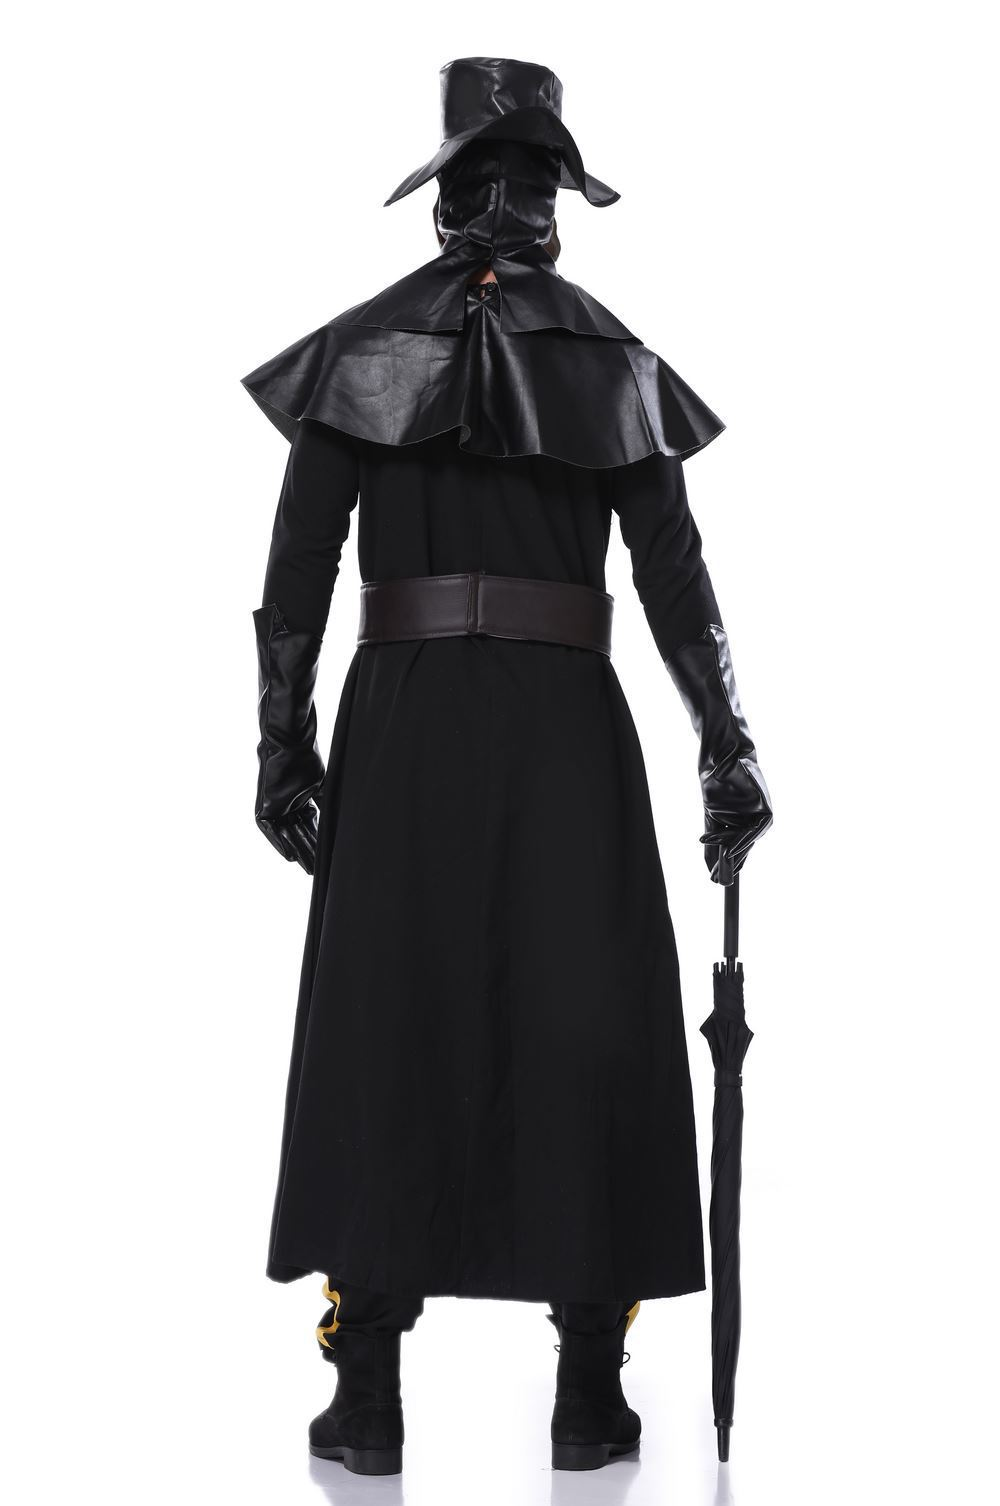 Halloween Cosplay plague beak doctor costume dark hero costume Venice carnival dress up 2